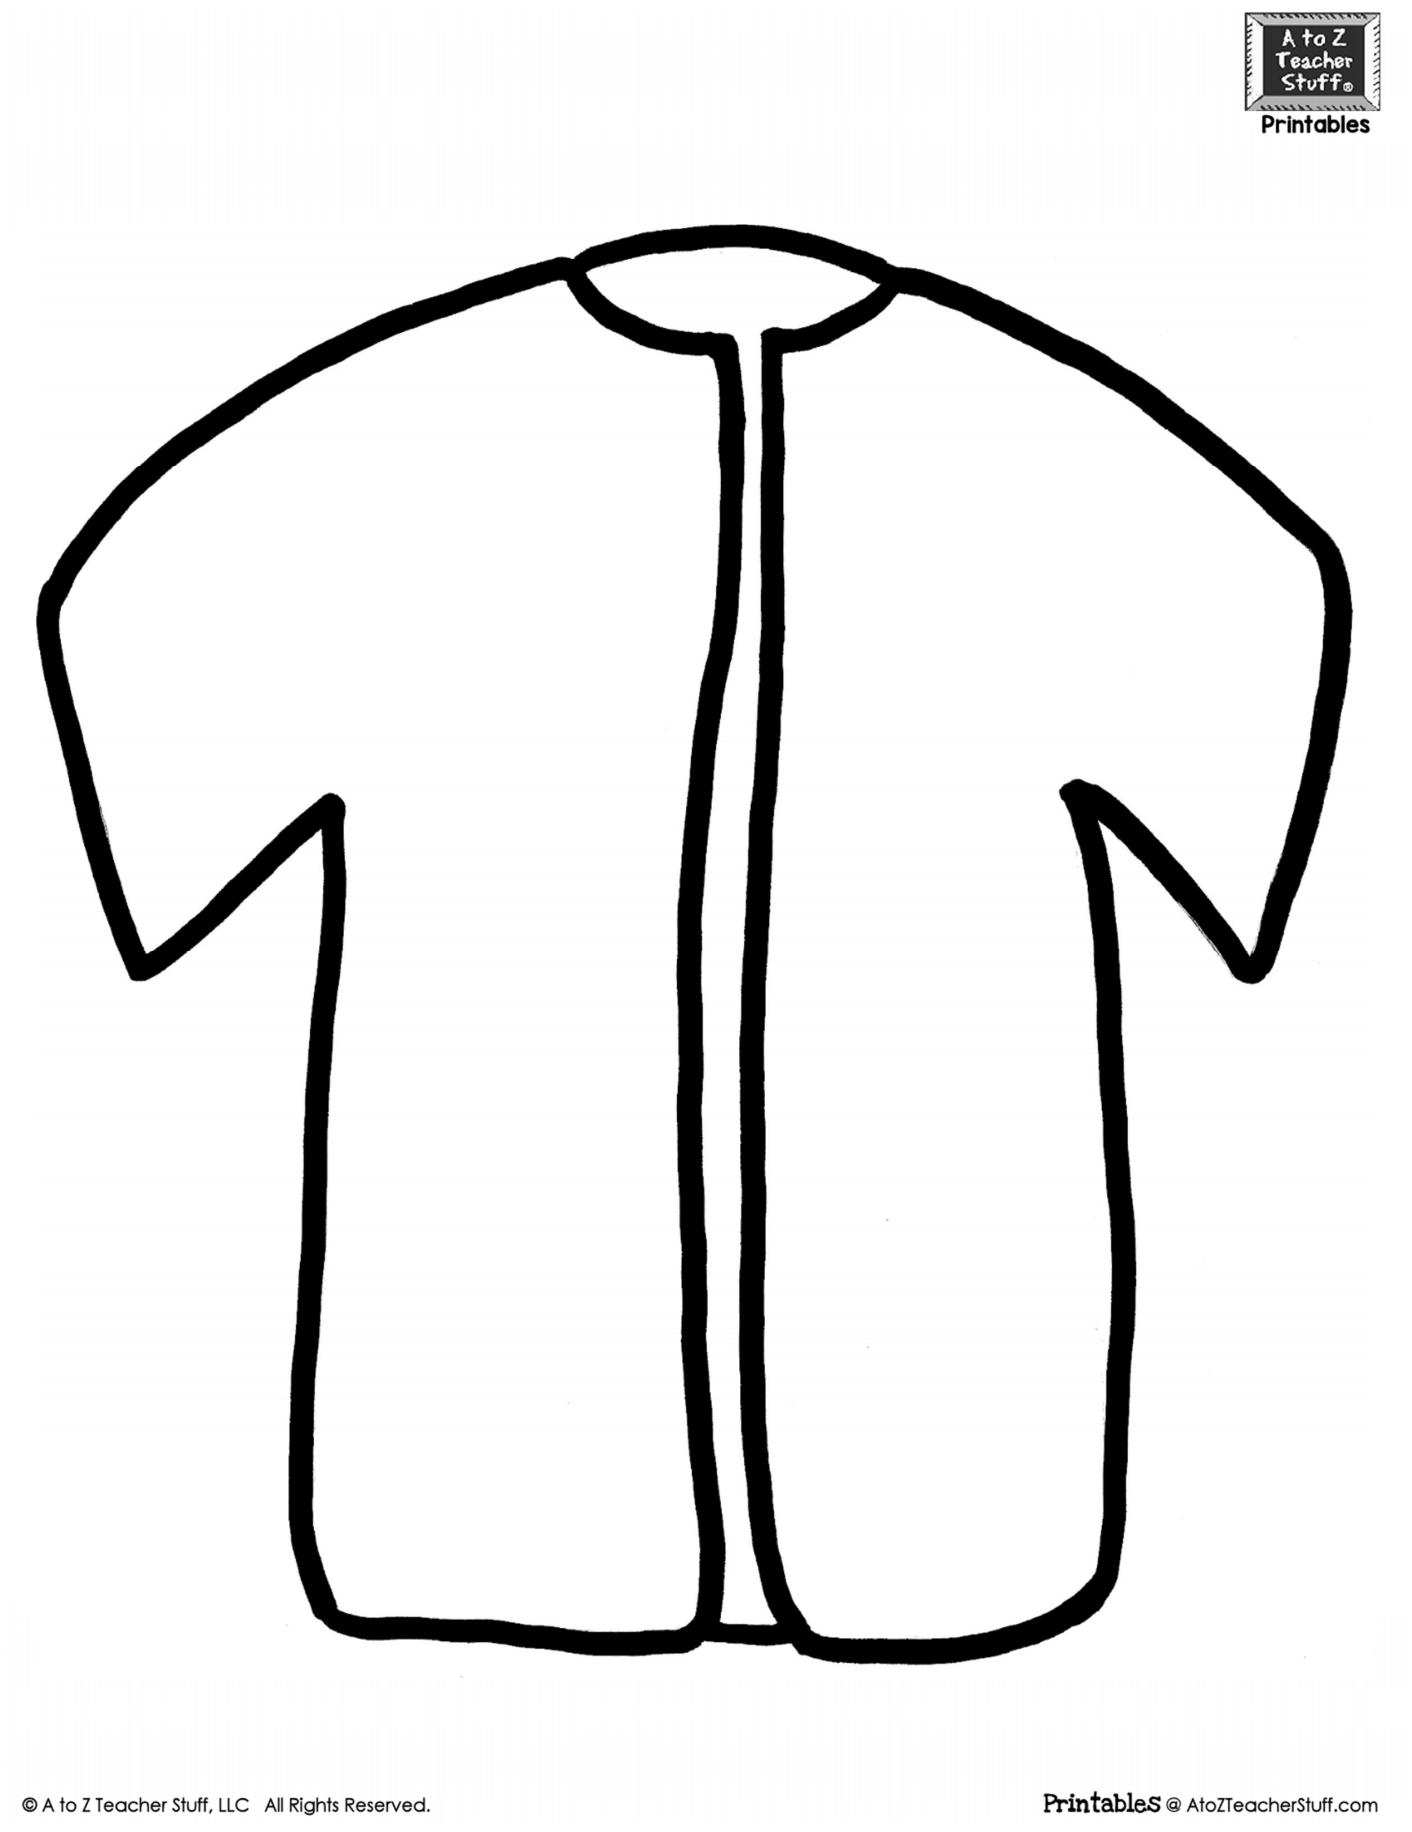 Shirt Or Jacket Outline Printable Pattern